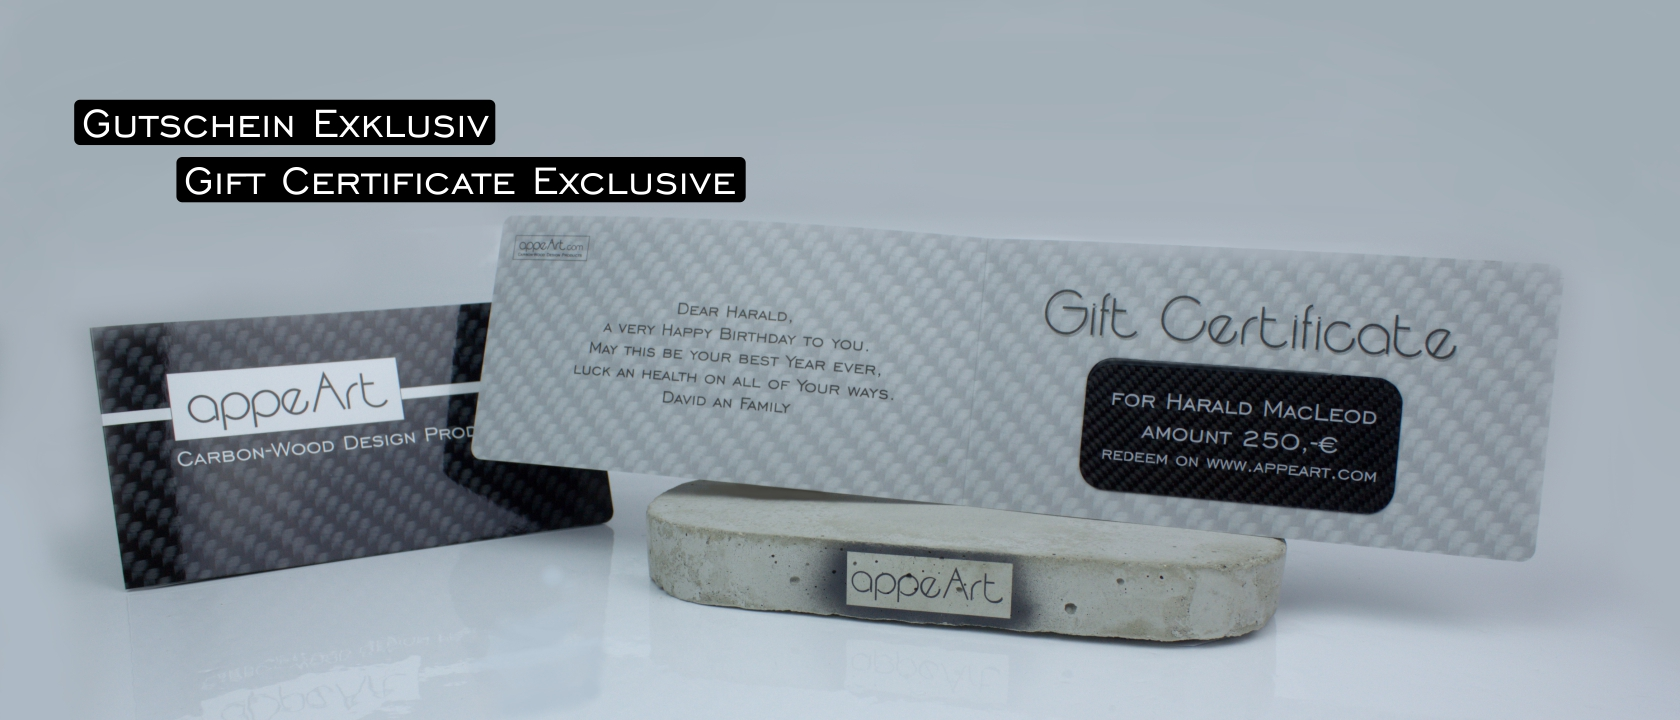 Geschenkgutschein Gift Certificate - appeArt - Carbon Wood Design Products